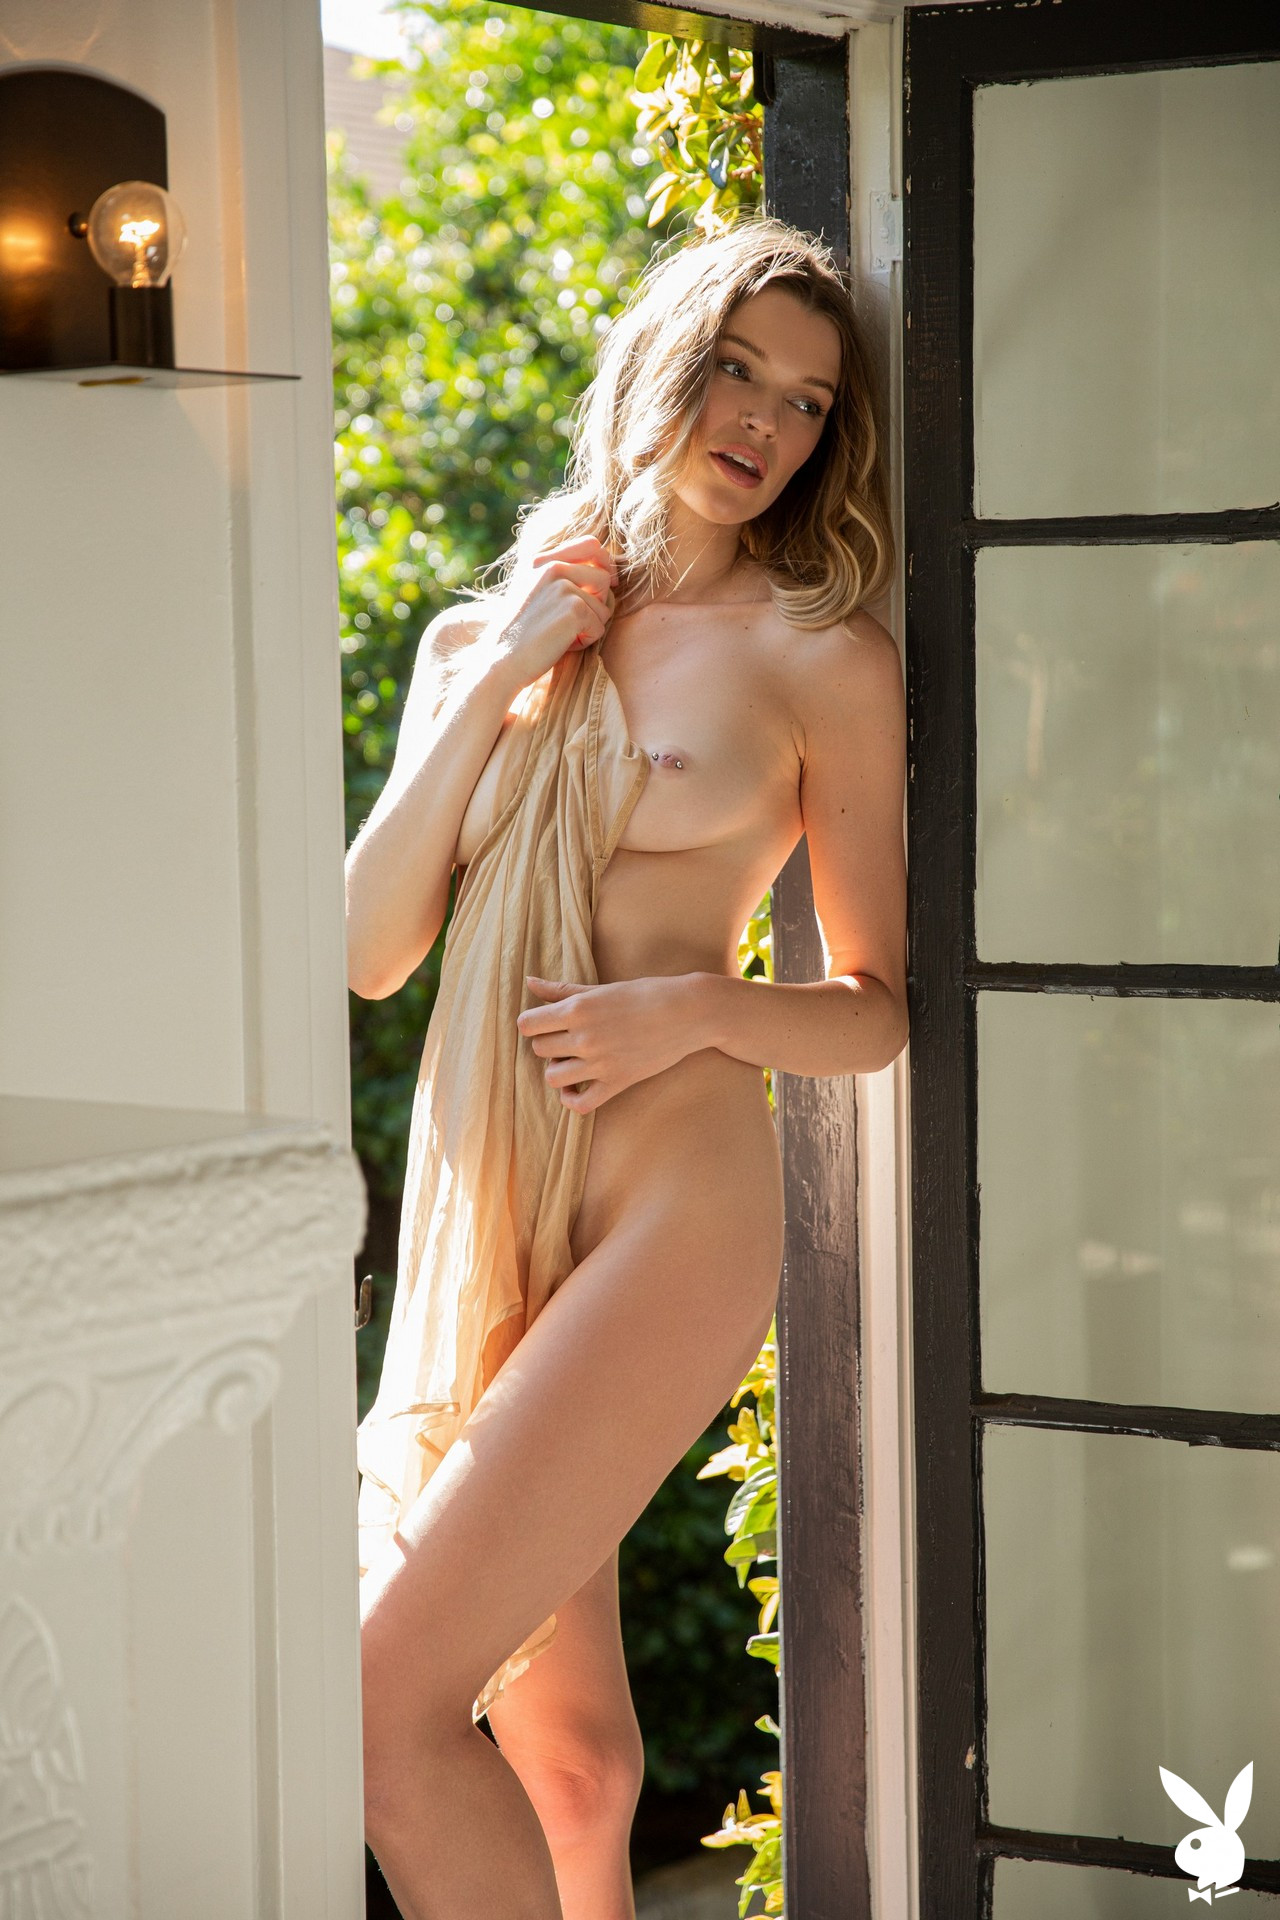 Brooke Lorraine In Simple Moments Playboy Plus (15)